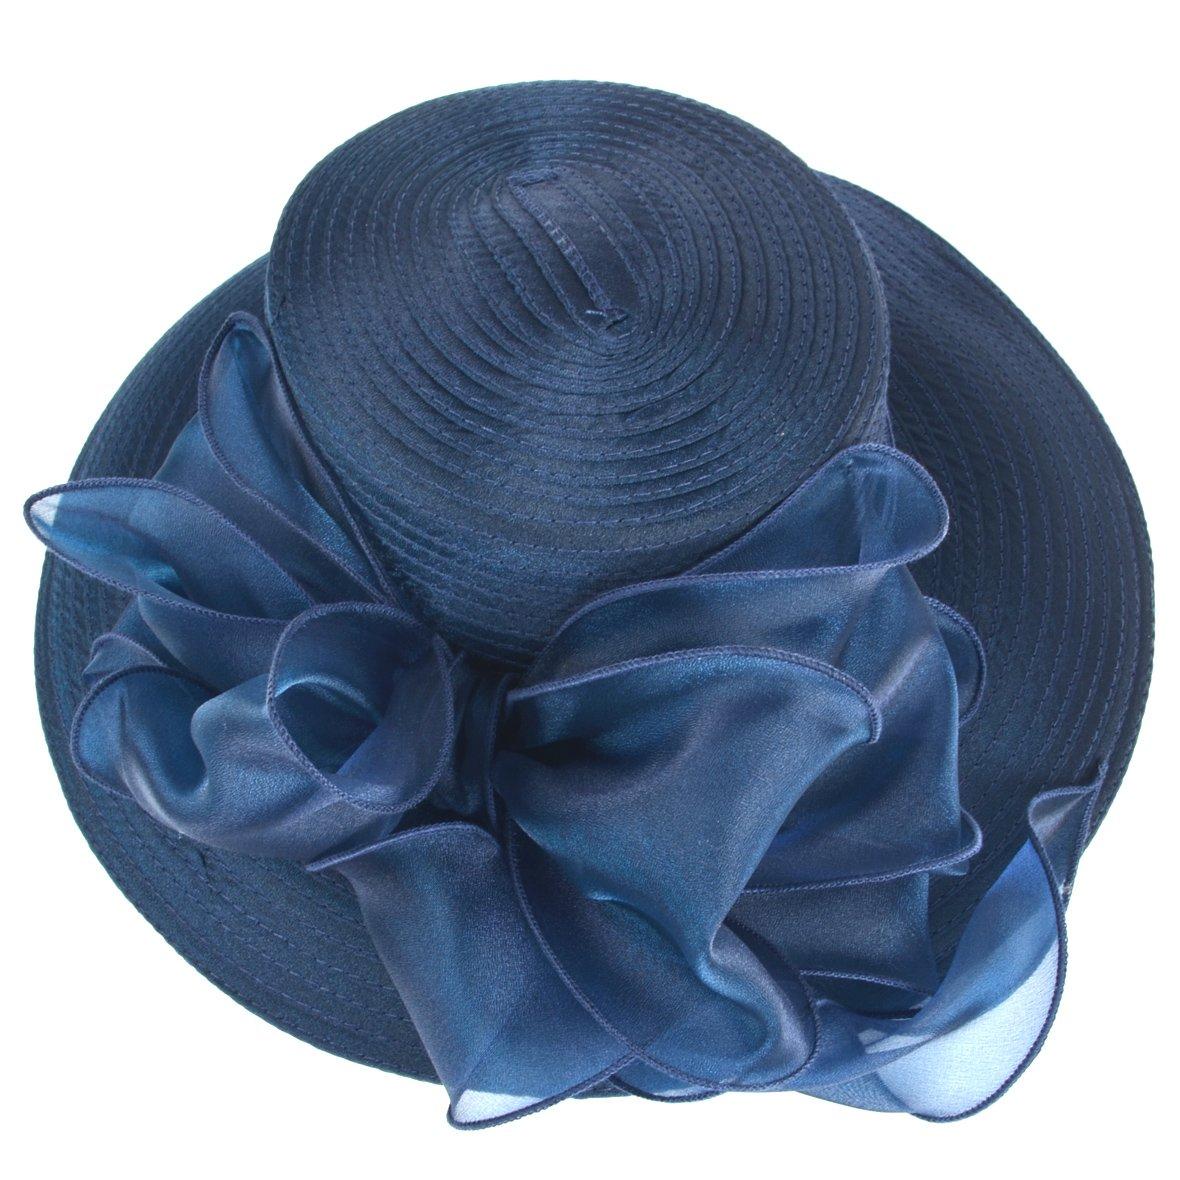 Women Kentucky Derby Church Dress Cloche Hat Fascinator Floral Tea Party Wedding Bucket Hat S052 (S062-Navy) by Ruphedy (Image #3)